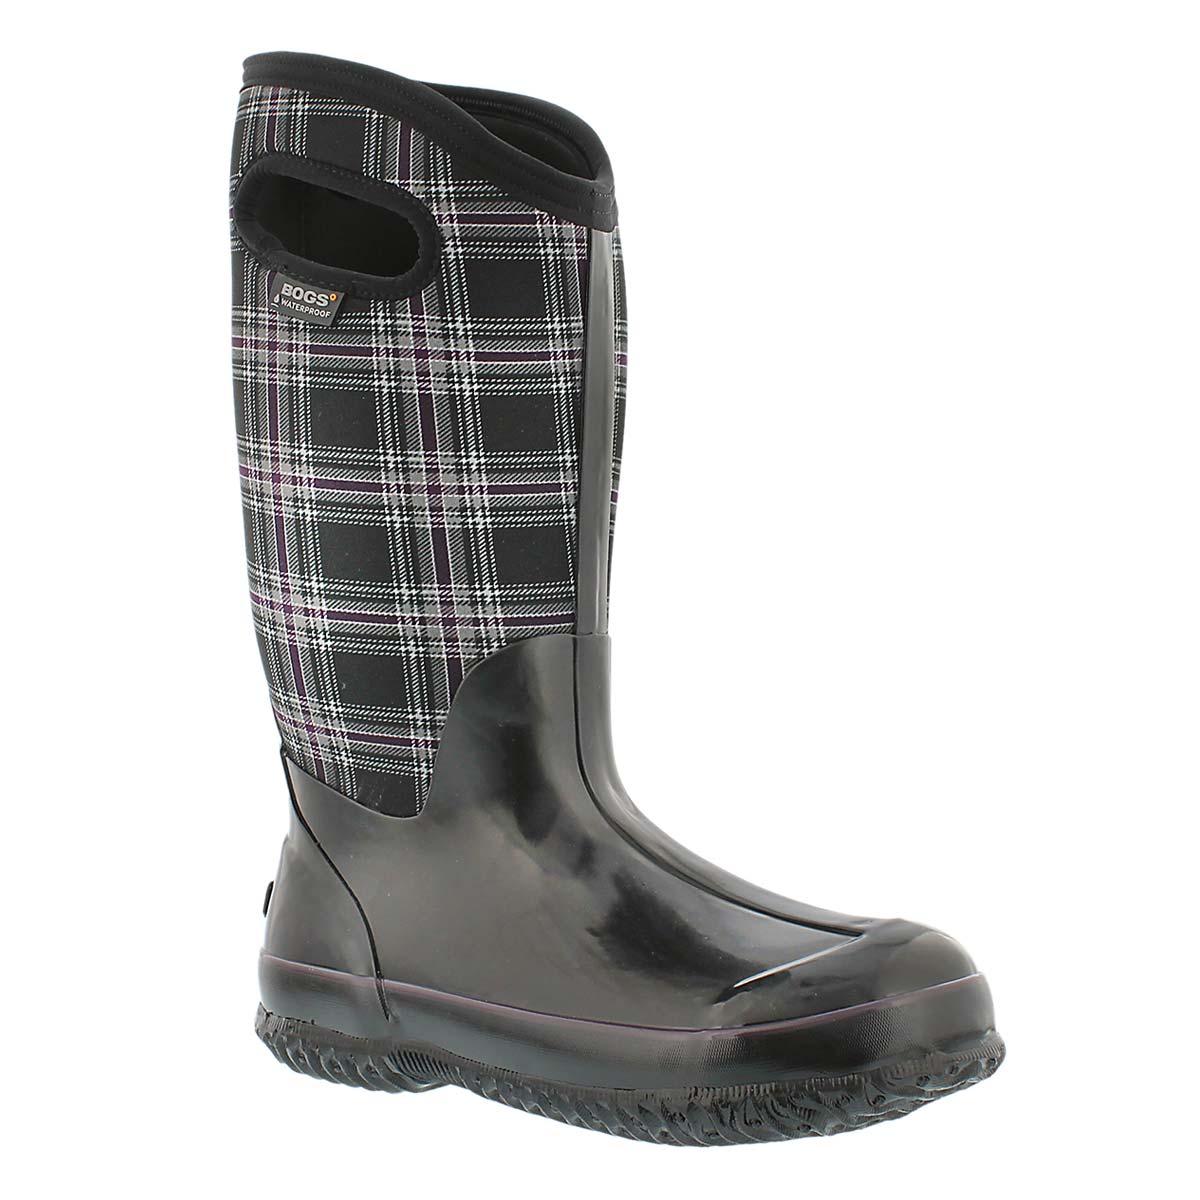 Women's WINTER PLAID black/multi winter boots